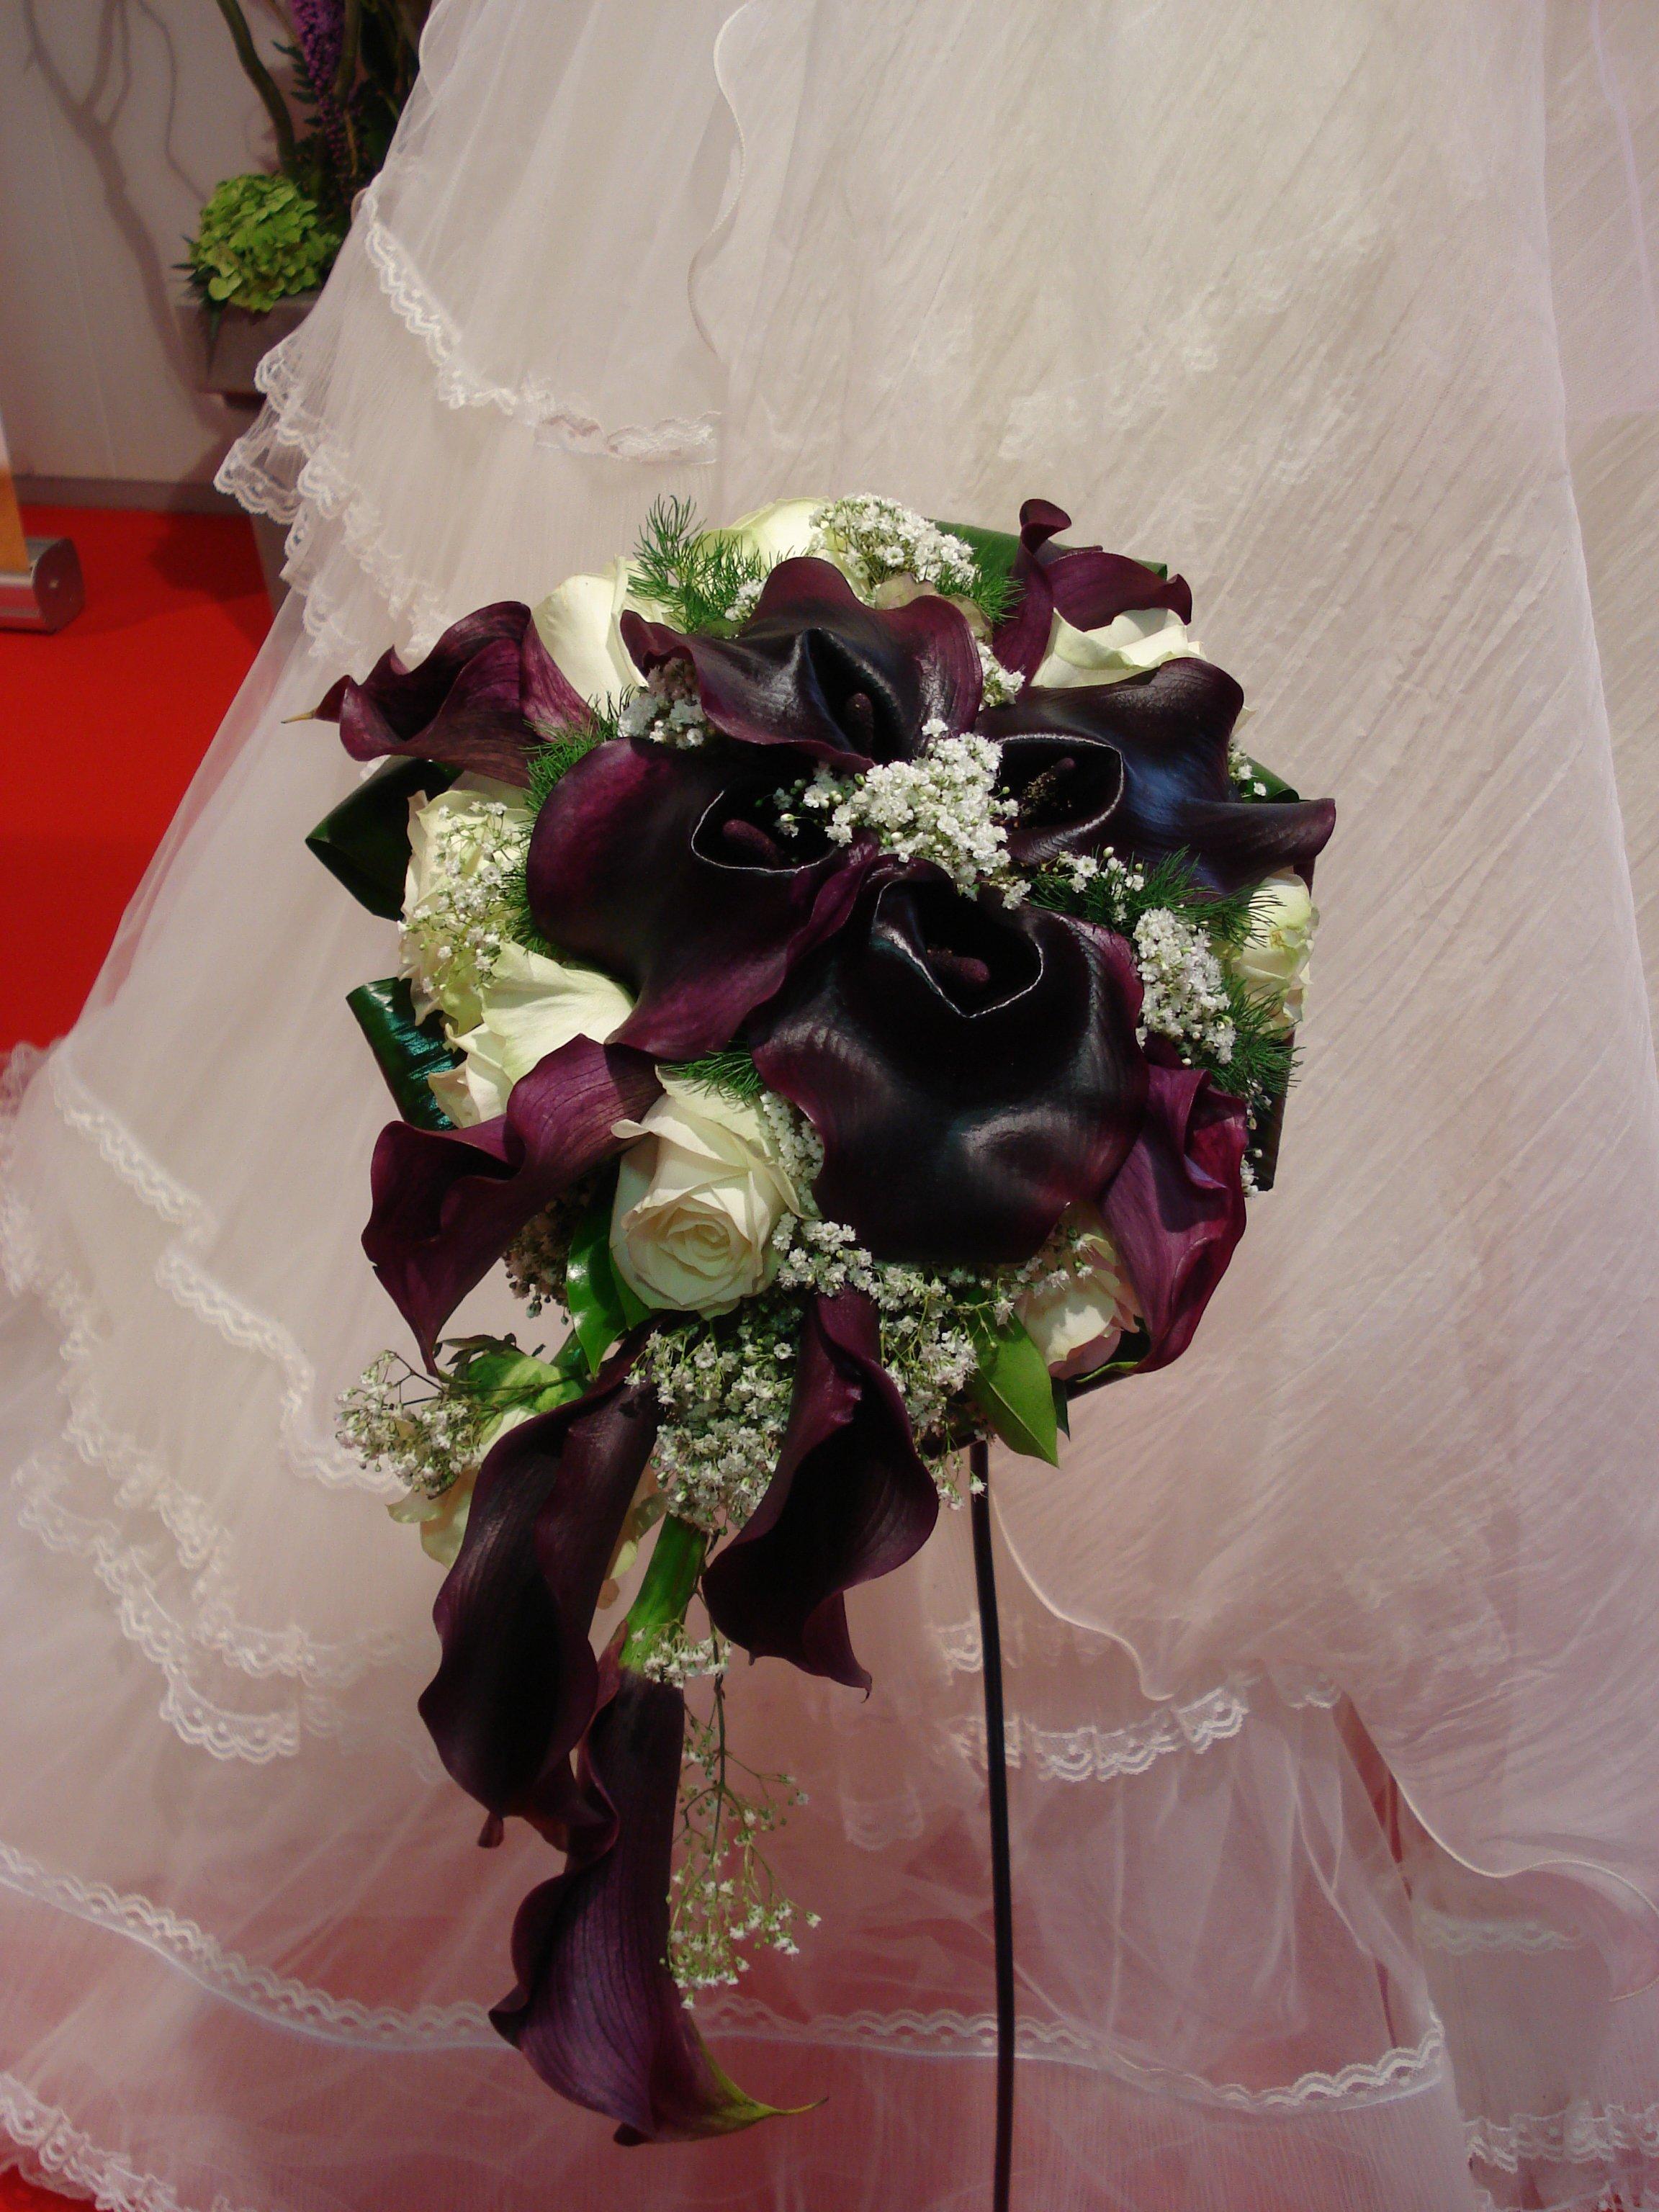 bouquet calle nere rose bianche e gipsofila